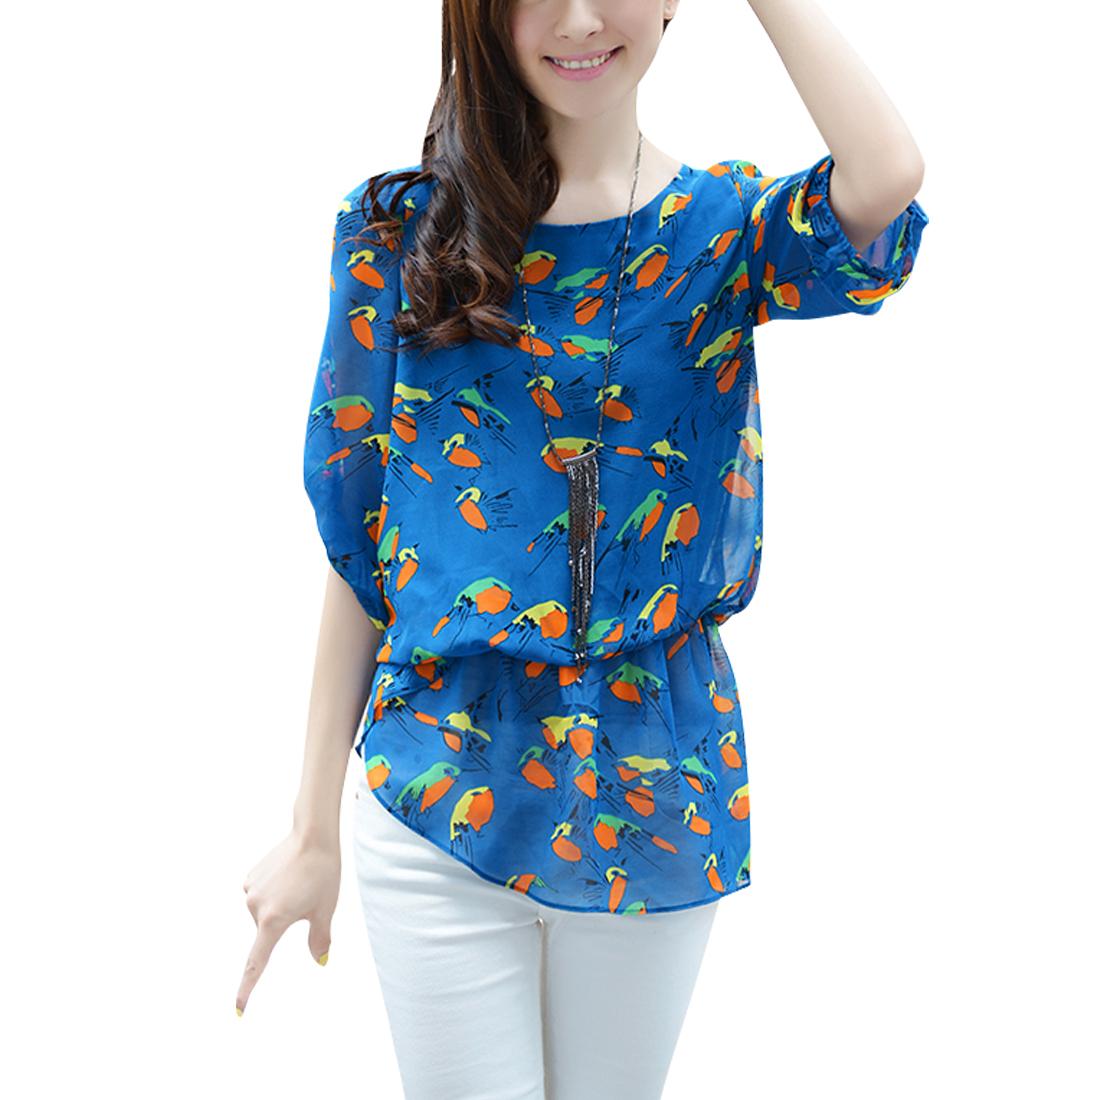 Ladies Birds Prints Round Neck Short-sleeved Chic Shirt Blue S